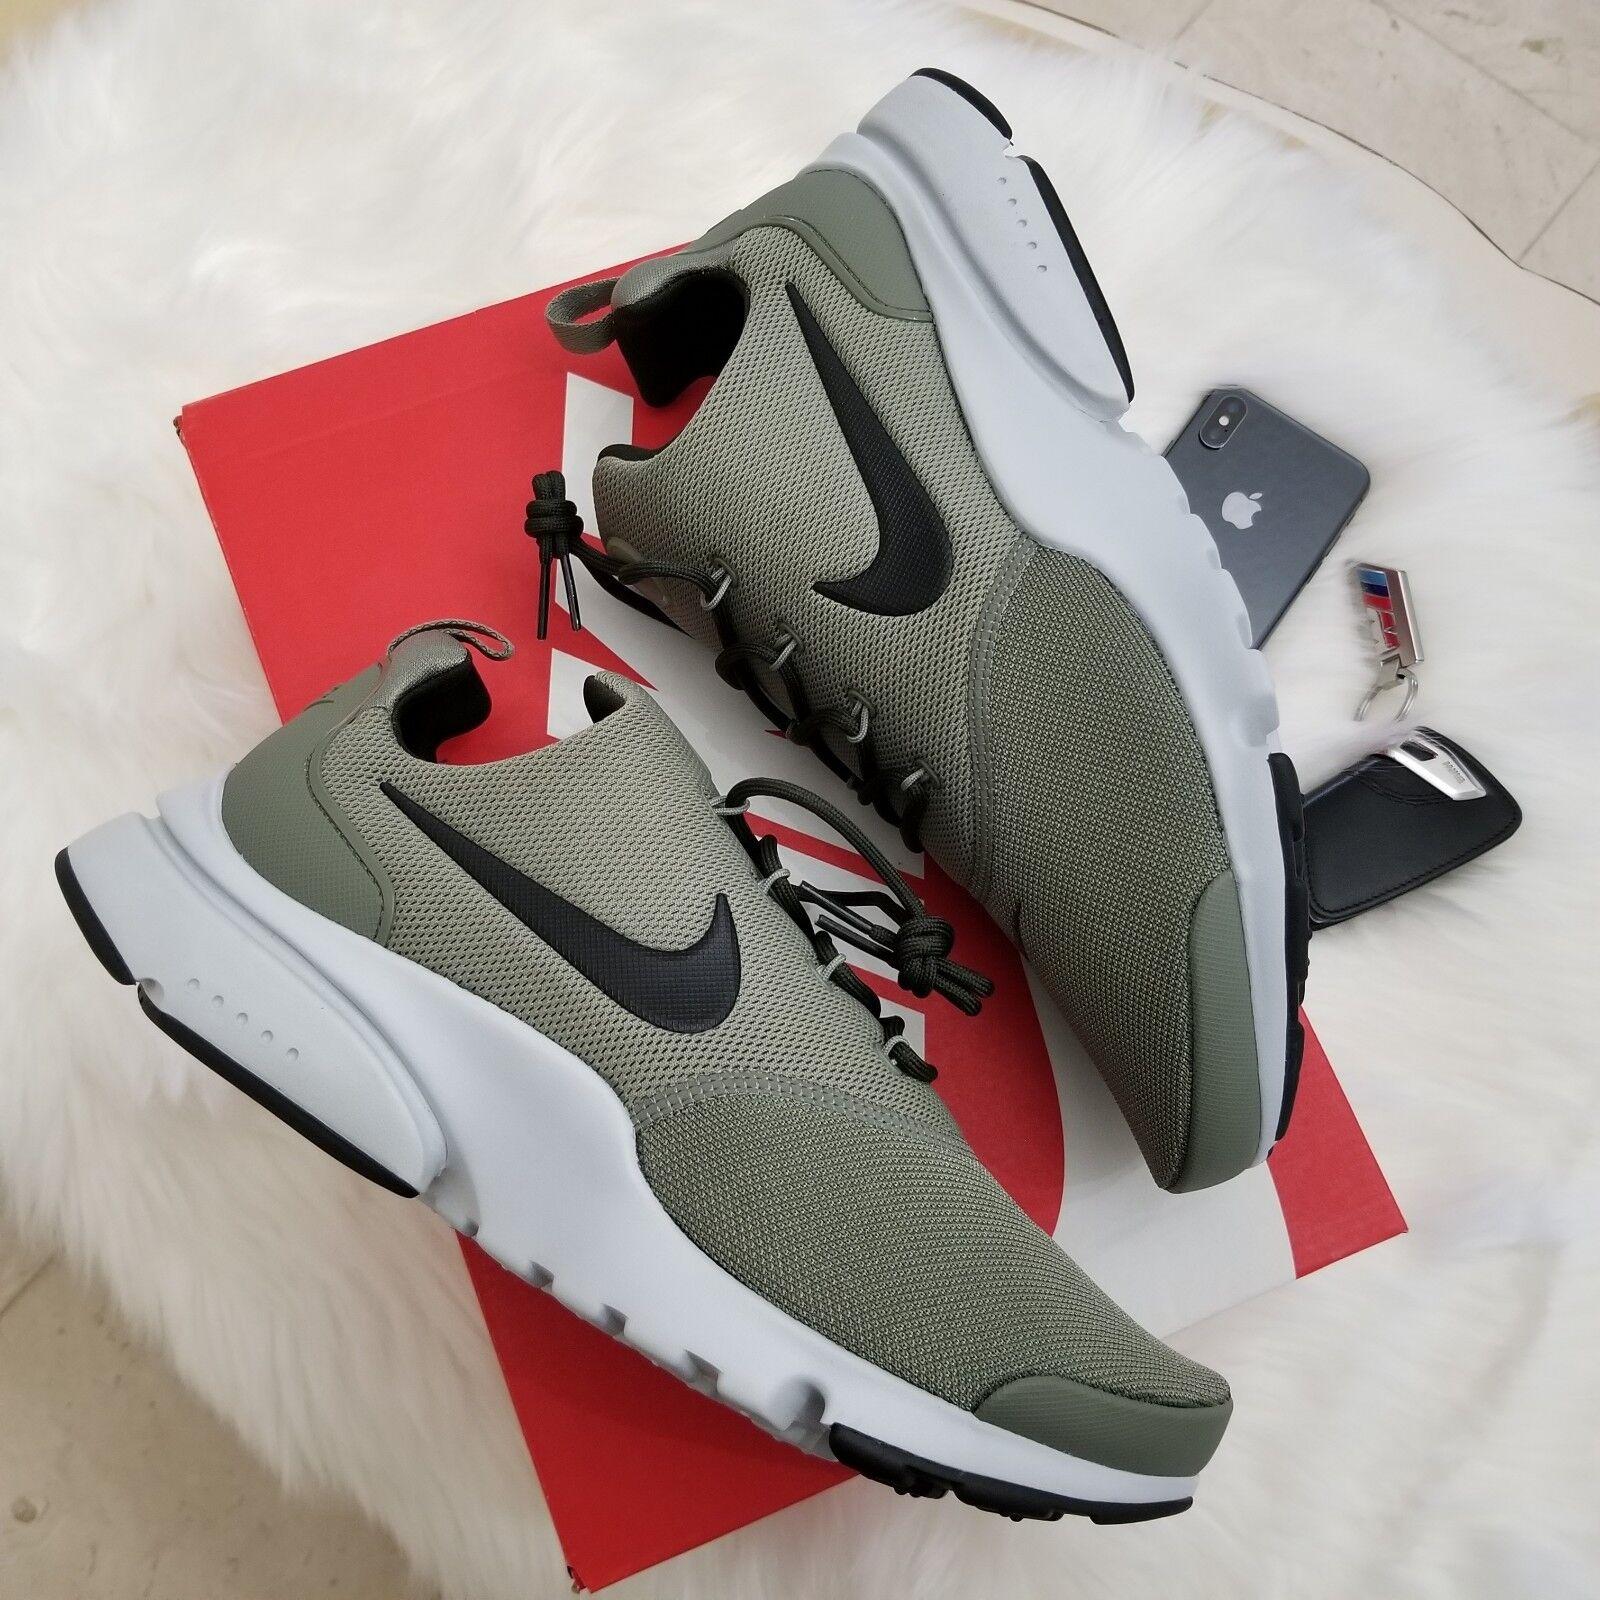 Nike Presto Fly Men's Shoes Dark 10 Stucco Men's Shoes Size 10 Dark Style 908019 011 58a19b